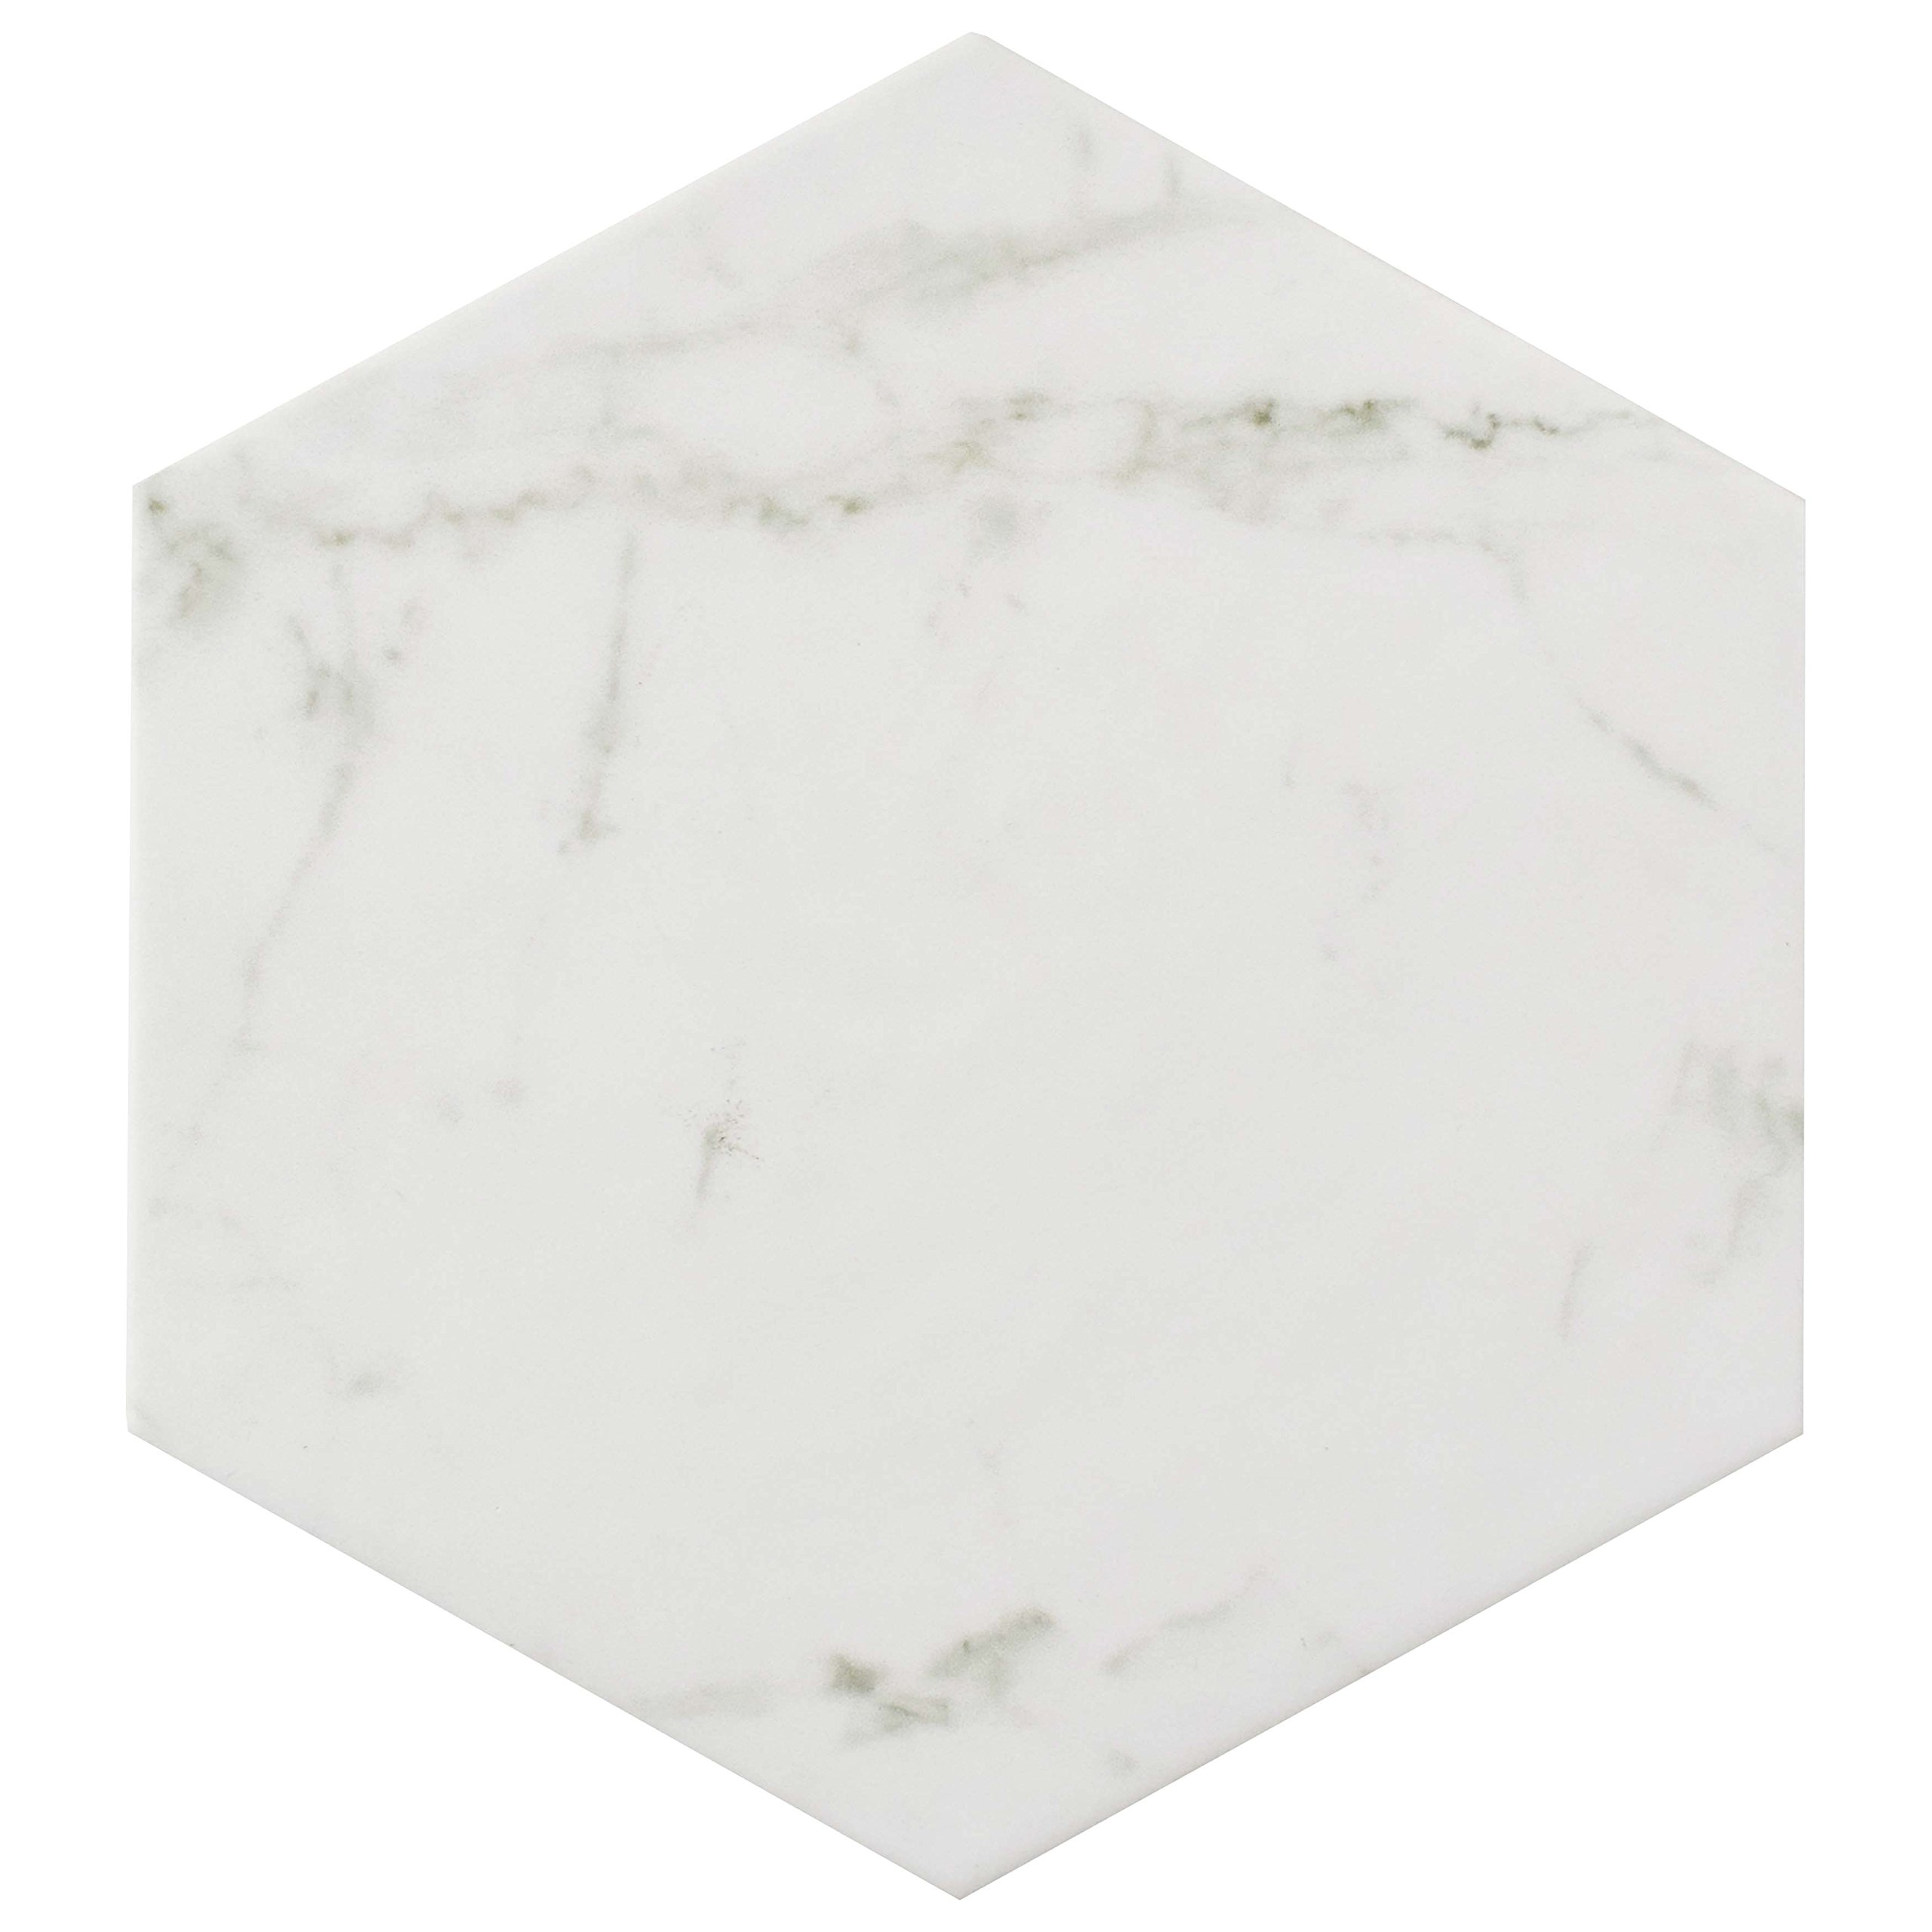 SomerTile FEQCRX Murmur Carrara Hexagon Porcelain Floor & Wall Tile, 7'' x 8'' (Pack of 25) by SOMERTILE (Image #3)